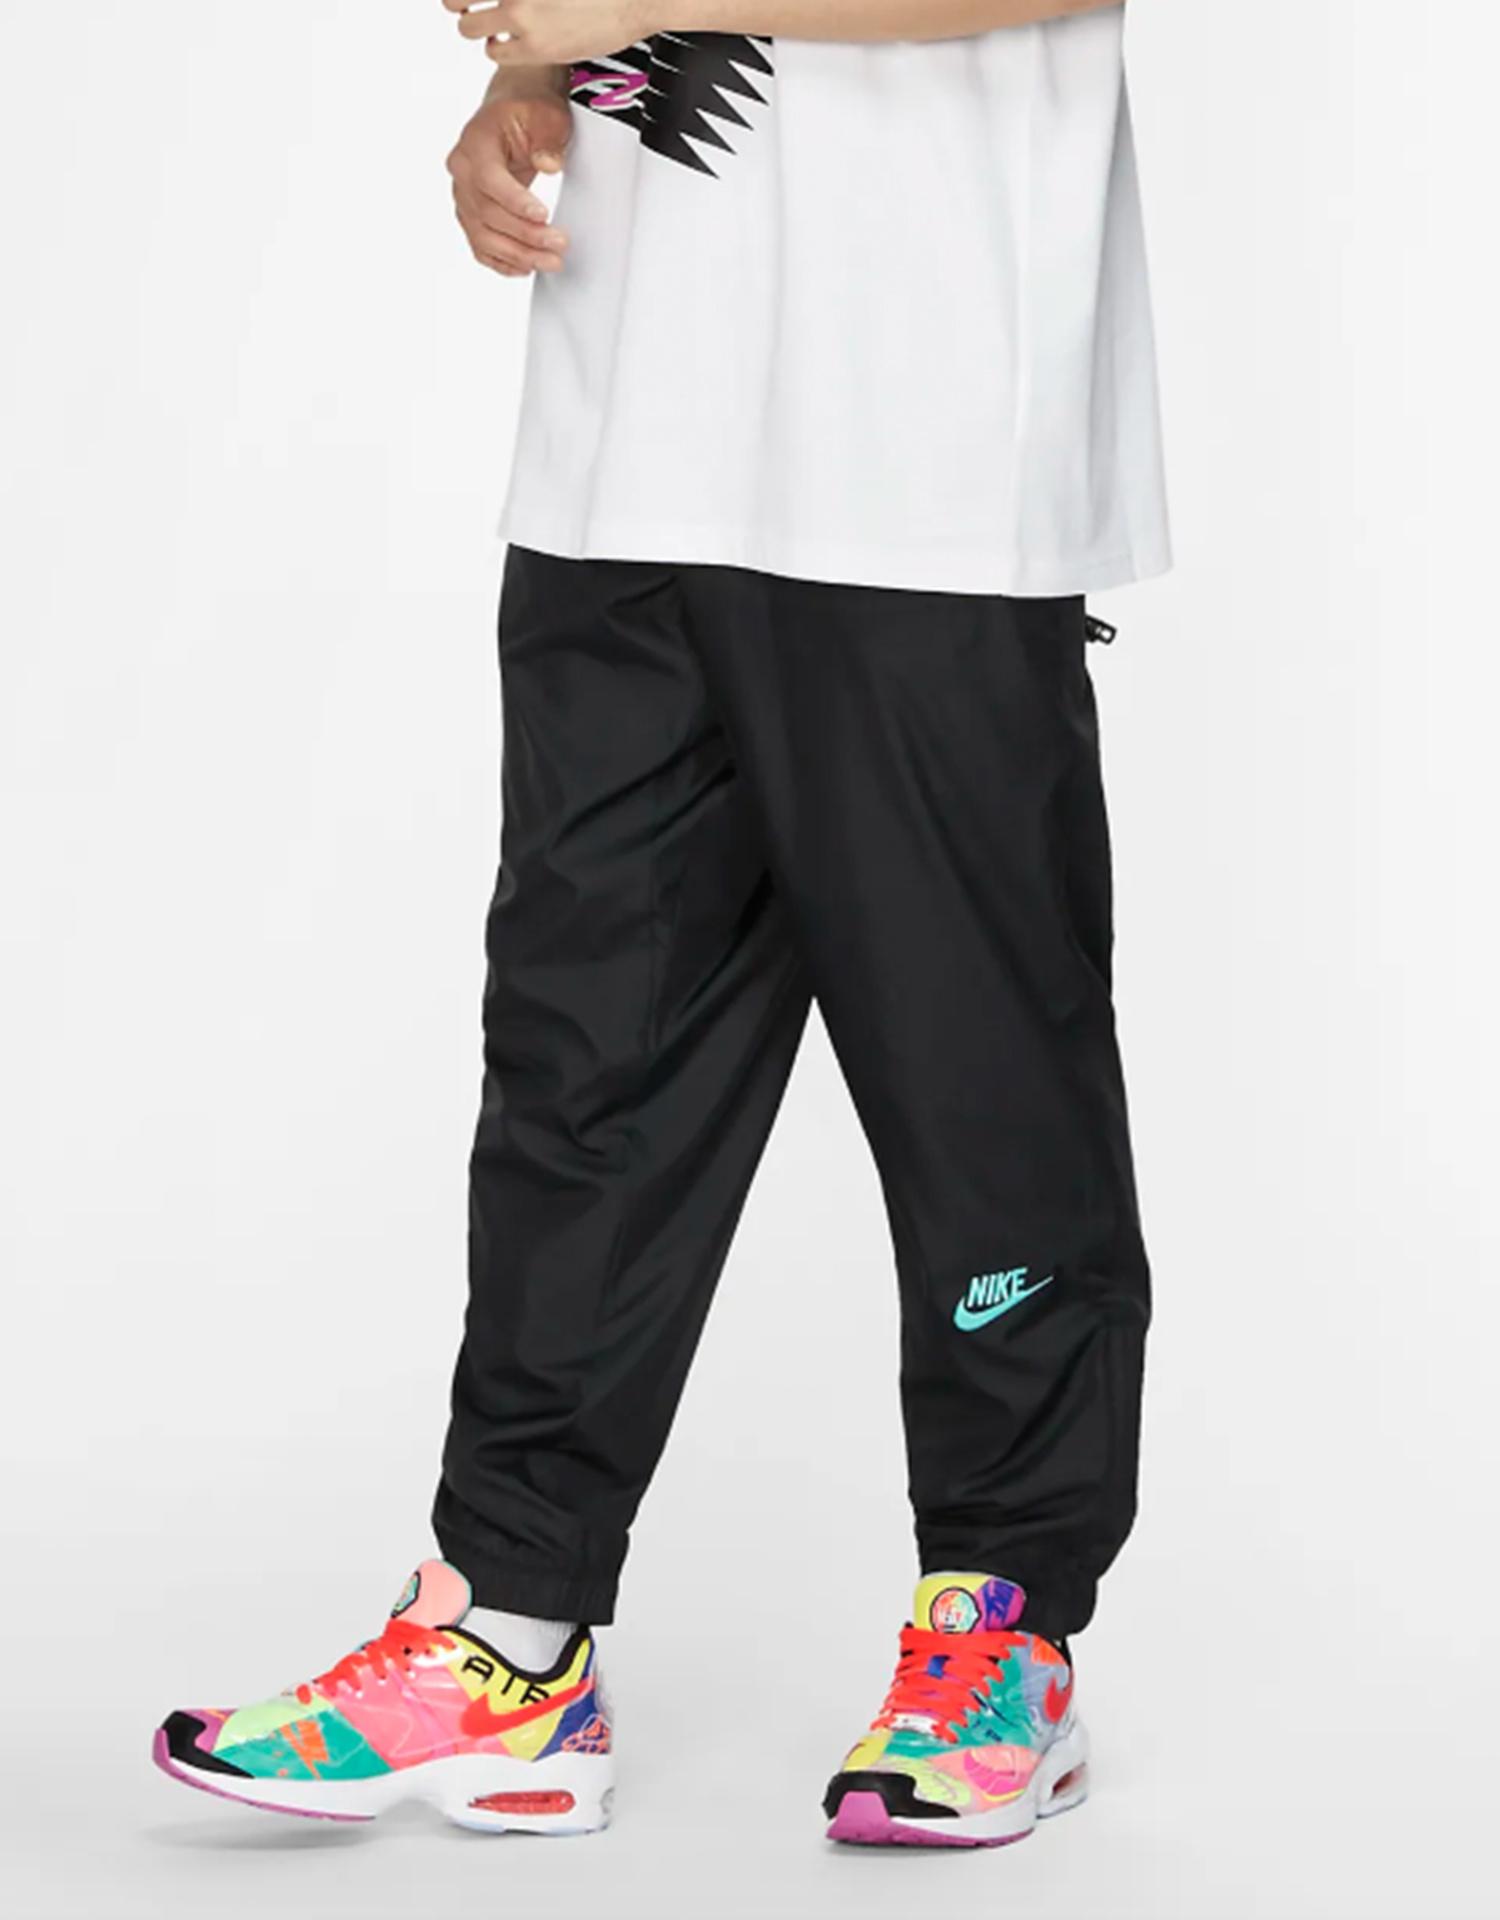 Nike x Atmos NRG VNTG Patchwork Track pant Black/ Hyper Jade